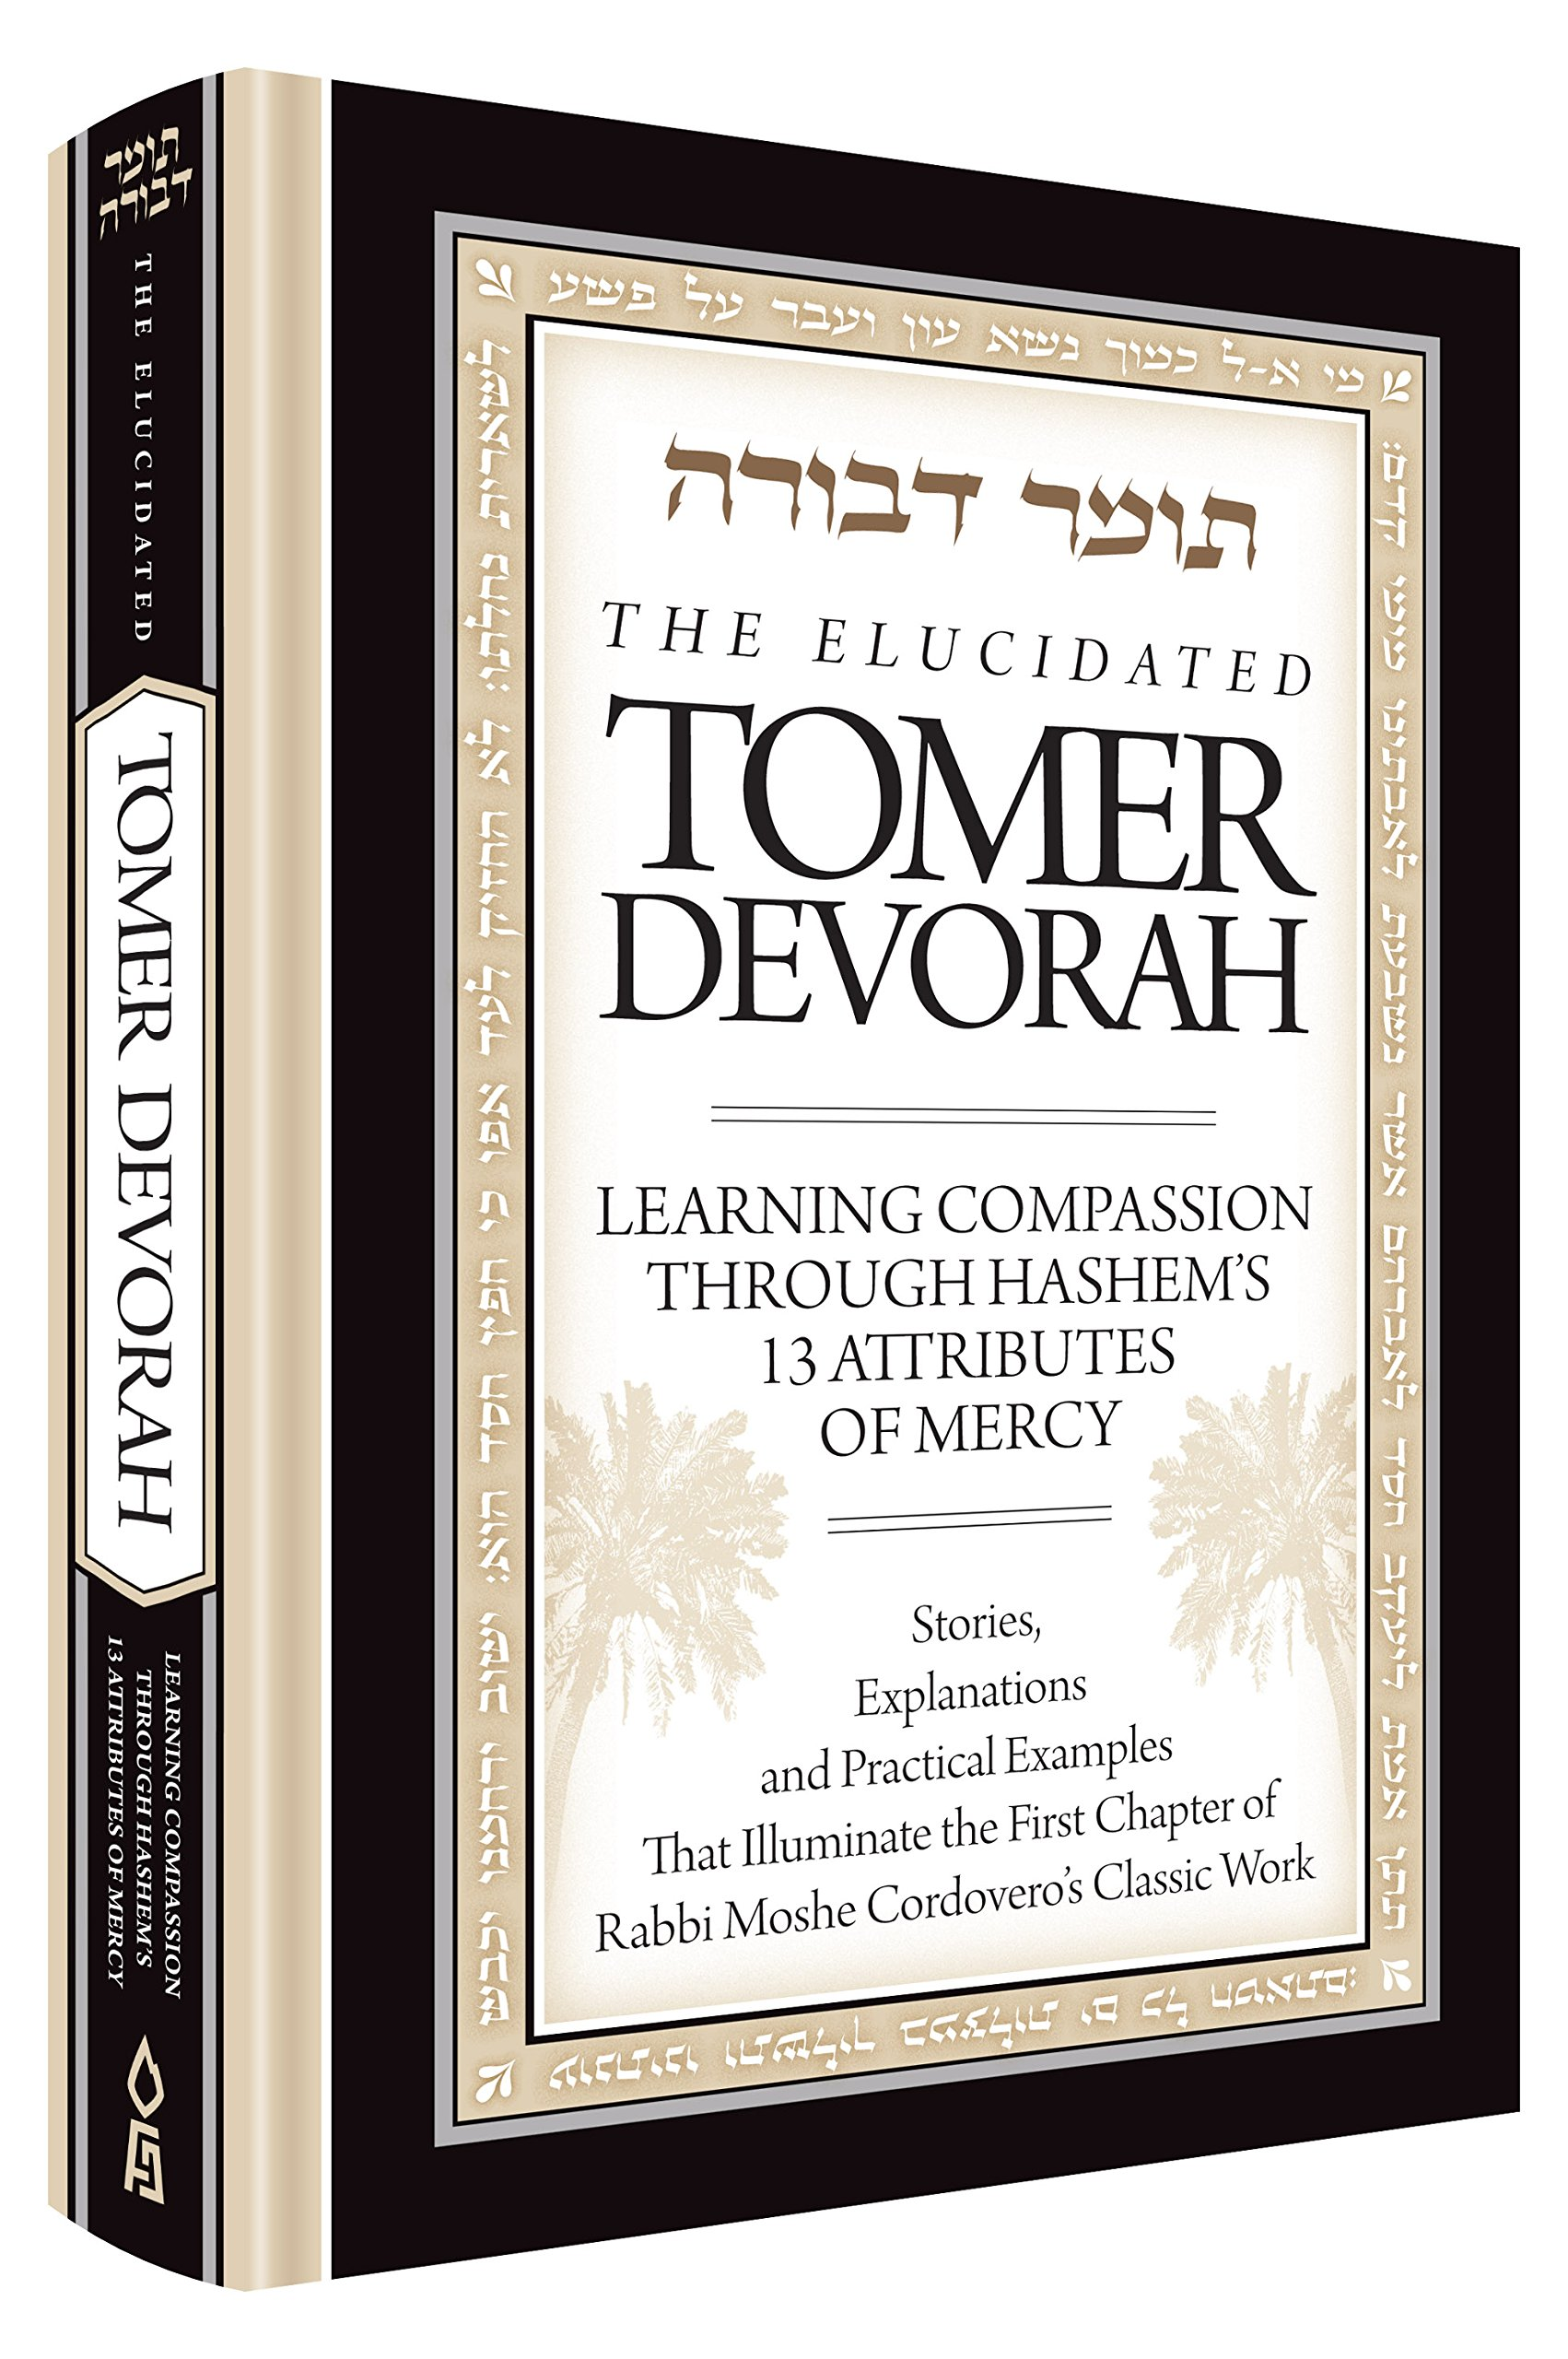 The elucidated tomer devorah rabbi shmuel meir riachi the elucidated tomer devorah rabbi shmuel meir riachi 9781680252088 amazon books fandeluxe Gallery